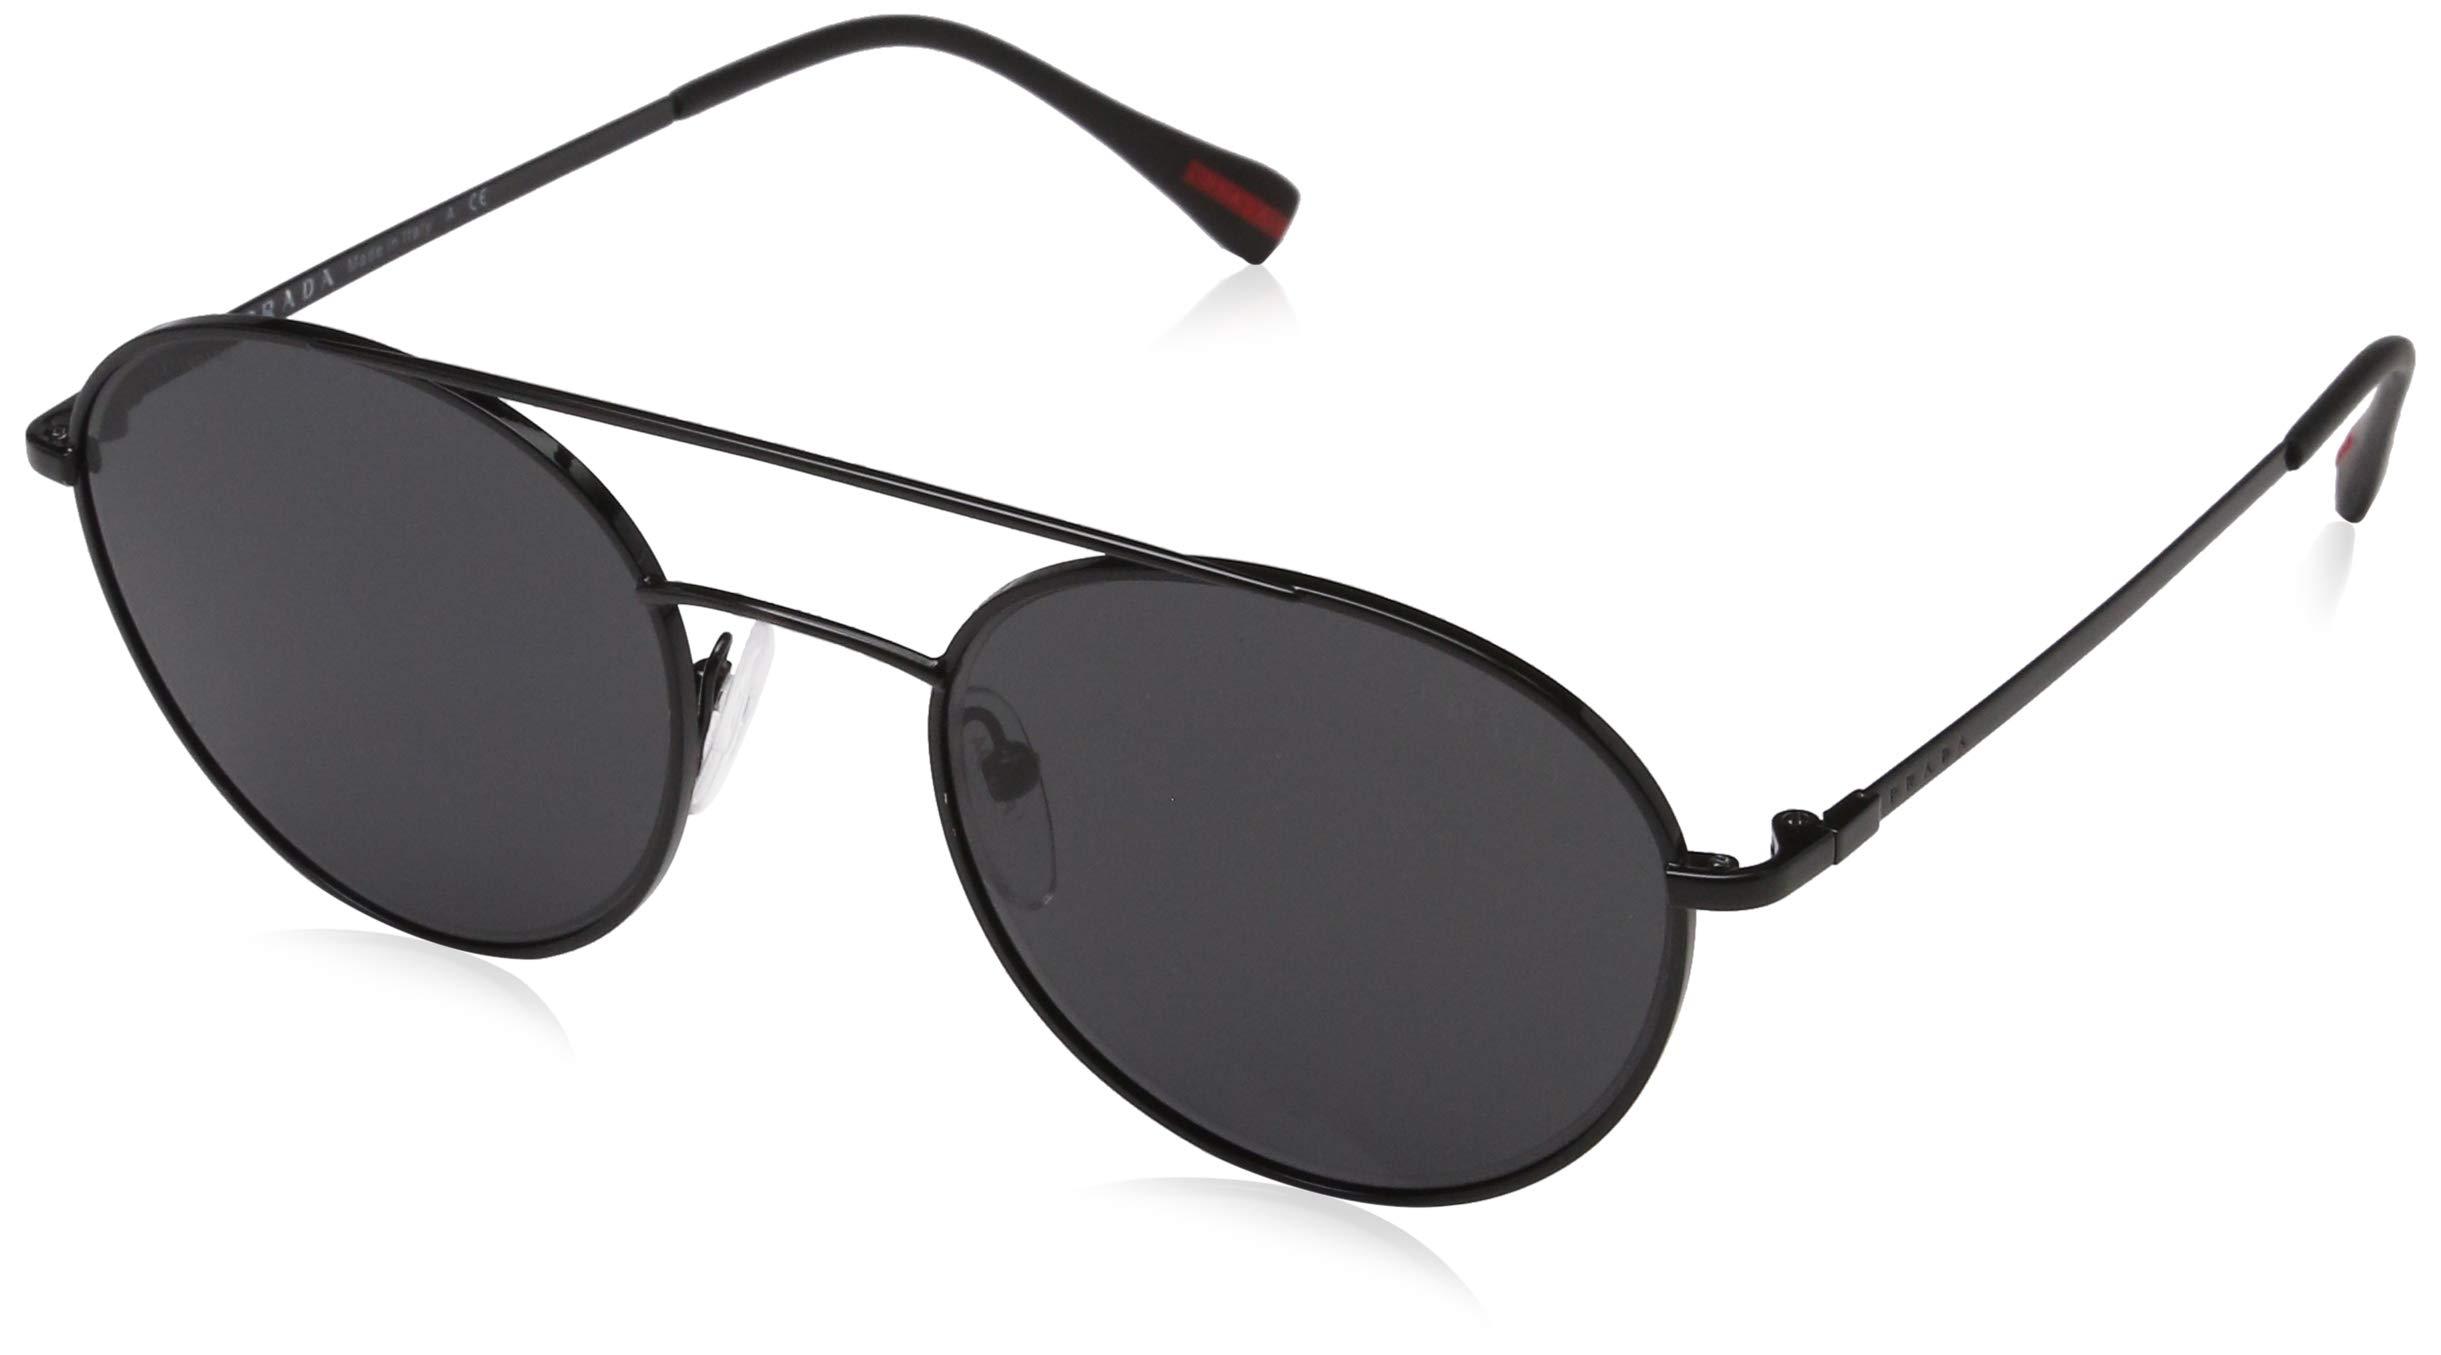 cliente primero seleccione original colores armoniosos ▷ Ofertas Prada Linea Rossa 0PS 50SS, Gafas de Sol para Hombre | Moda  Ofertastop